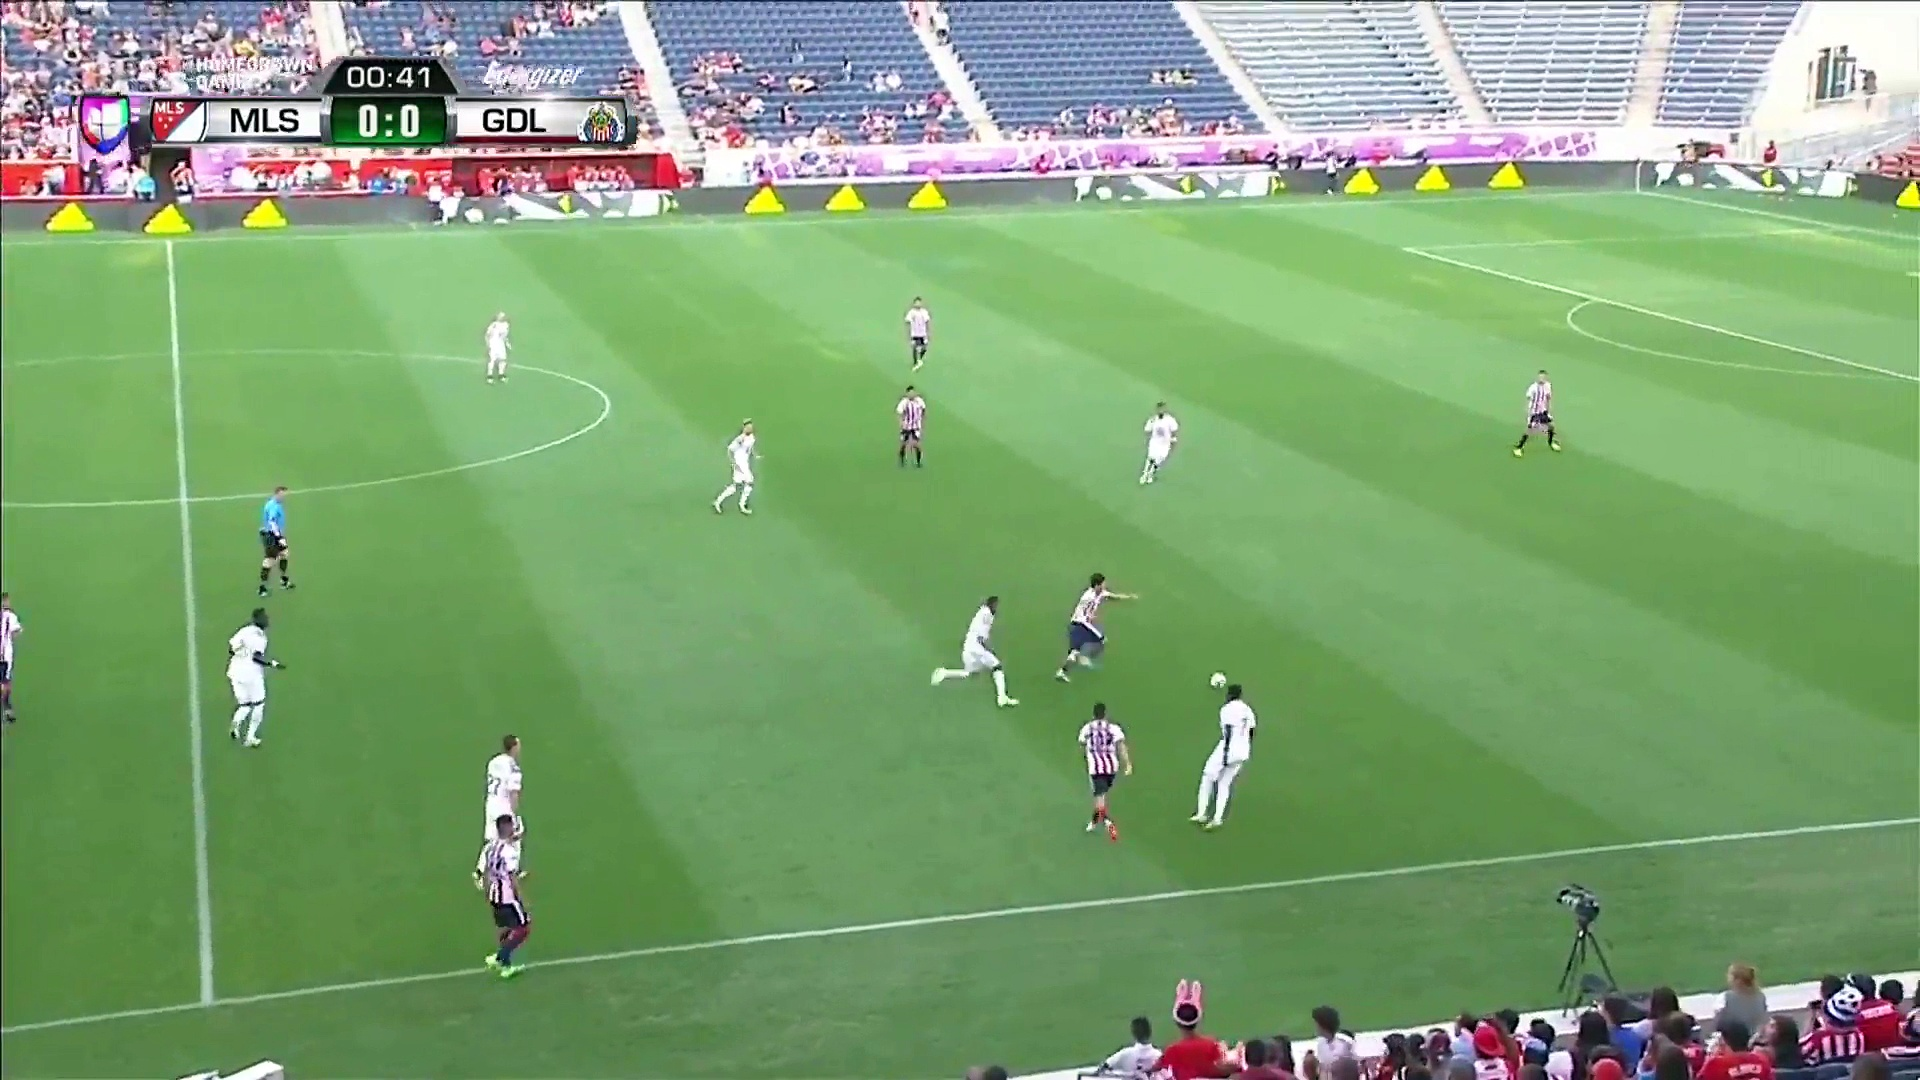 HIGHLIGHTS: MLS Homegrown Team 2-2 Guadalajara U20